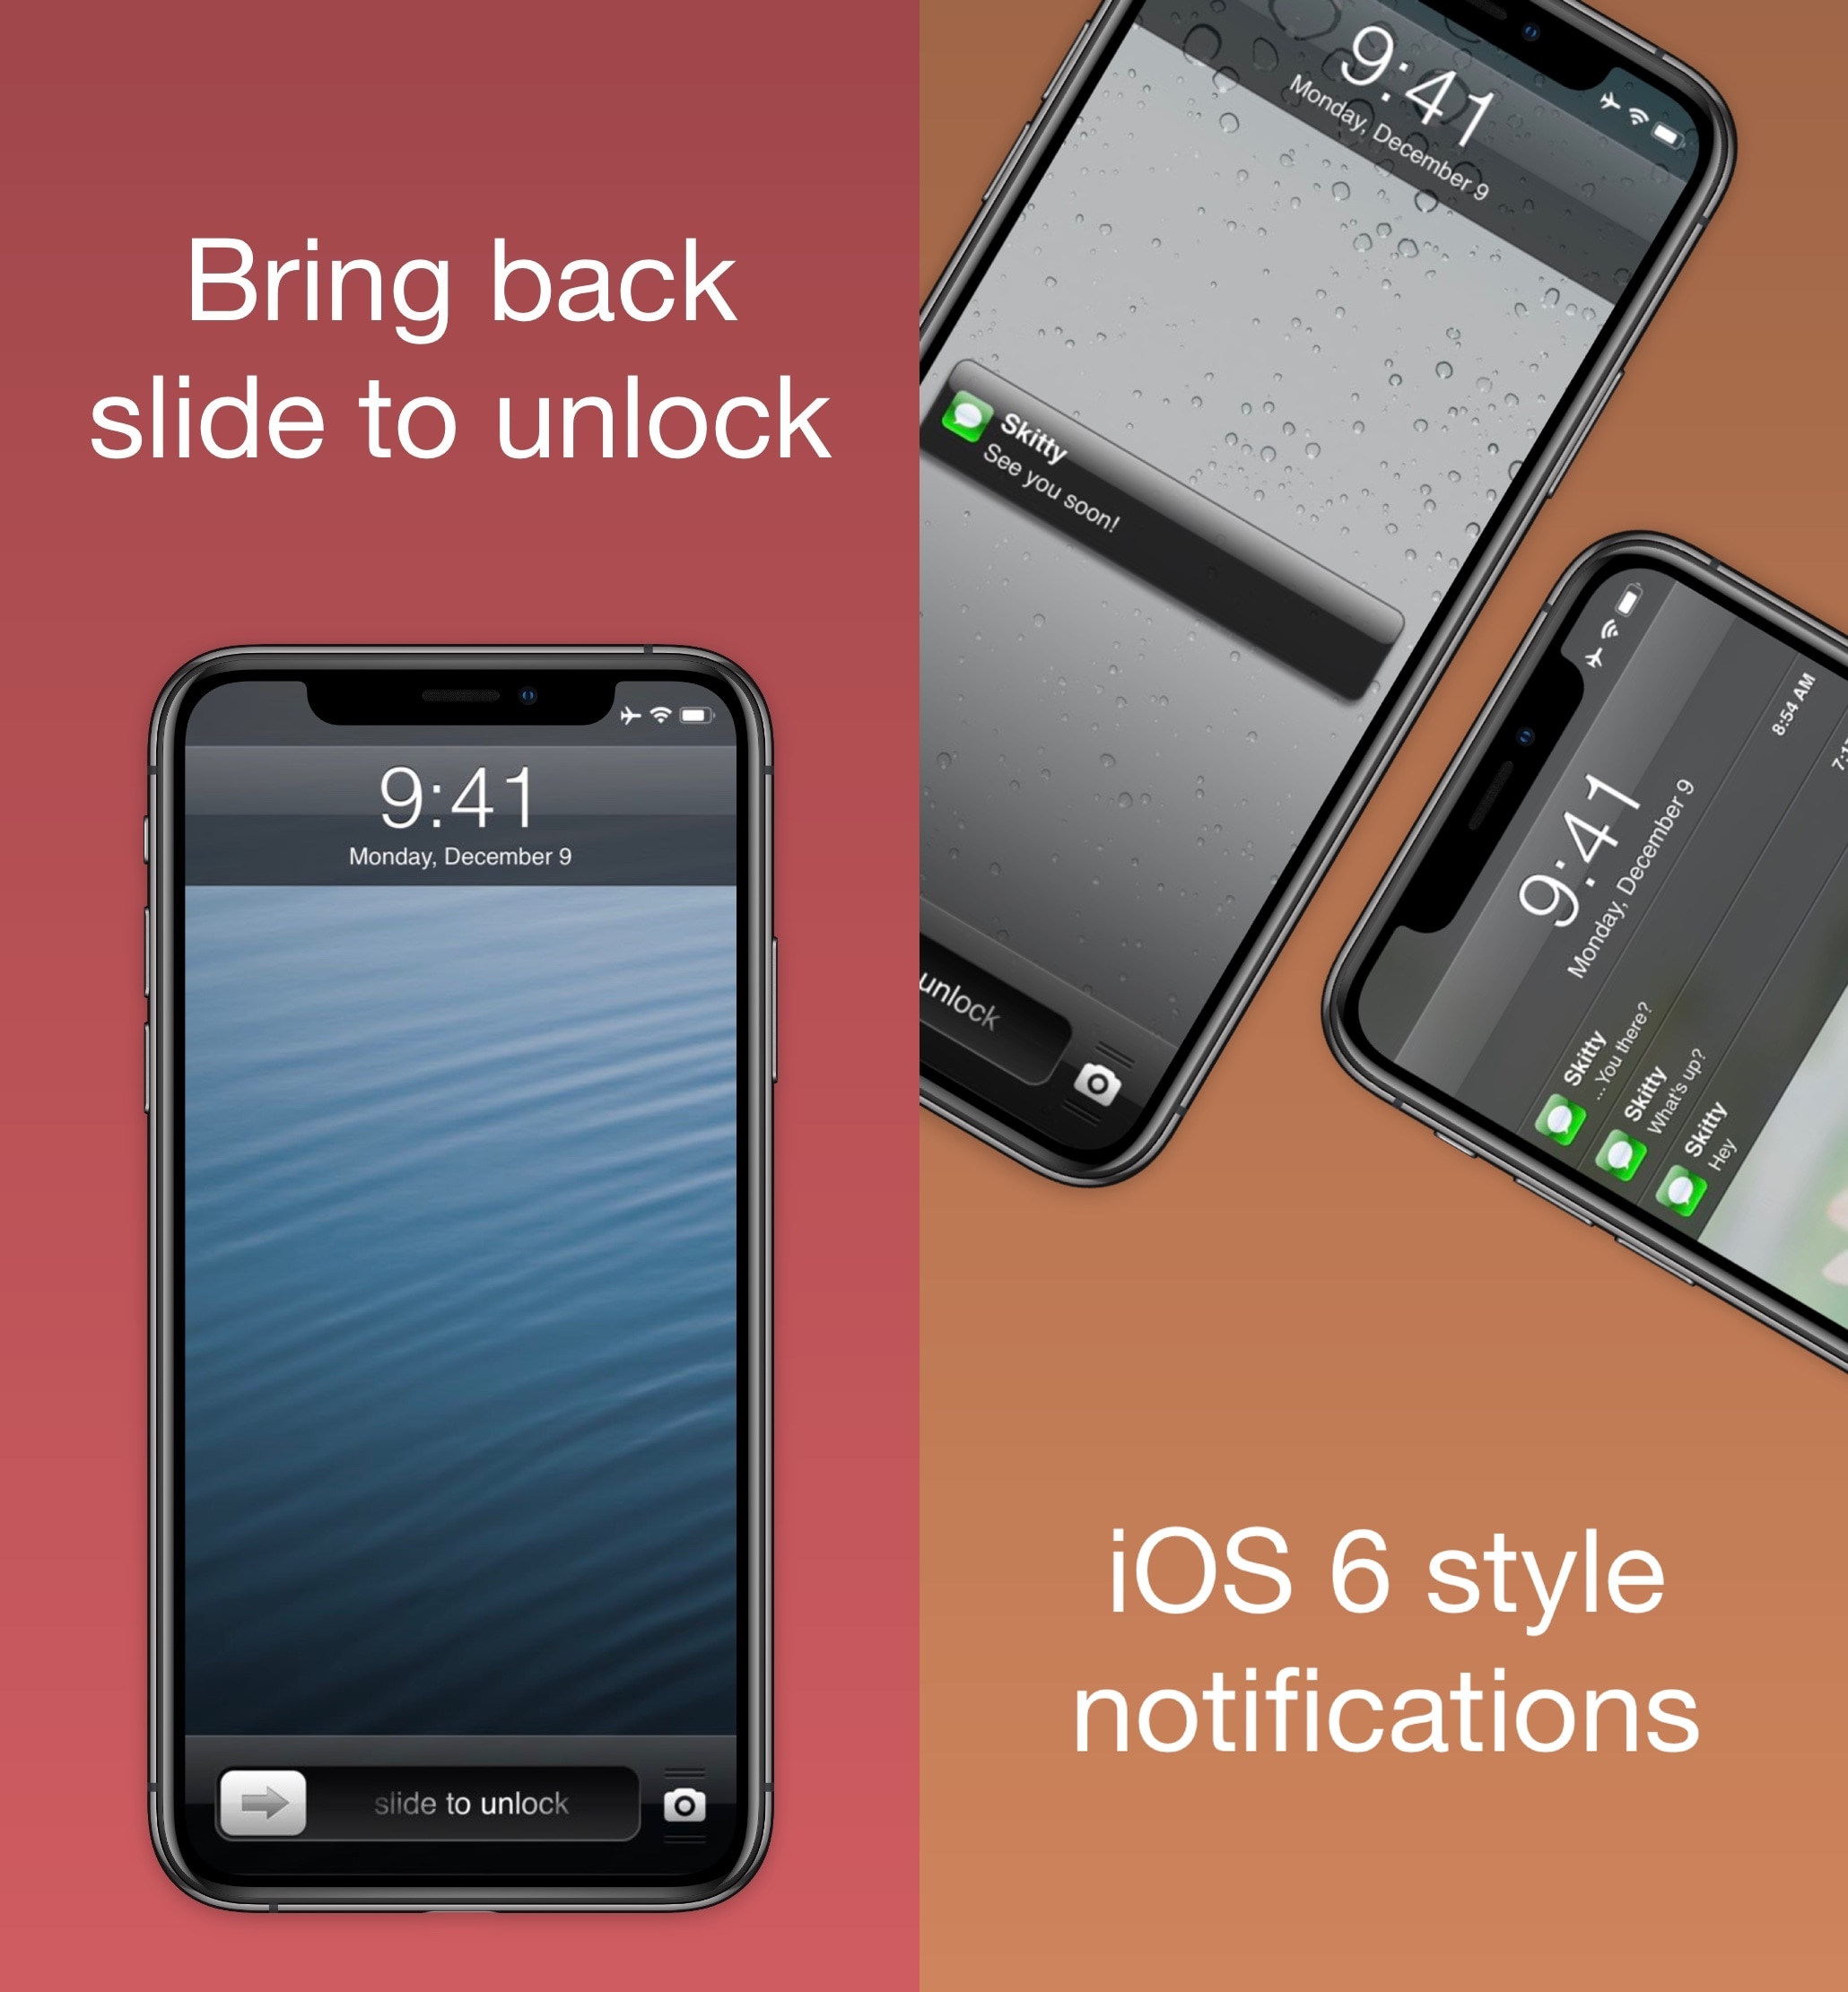 ios 6 jailbreak download free apps